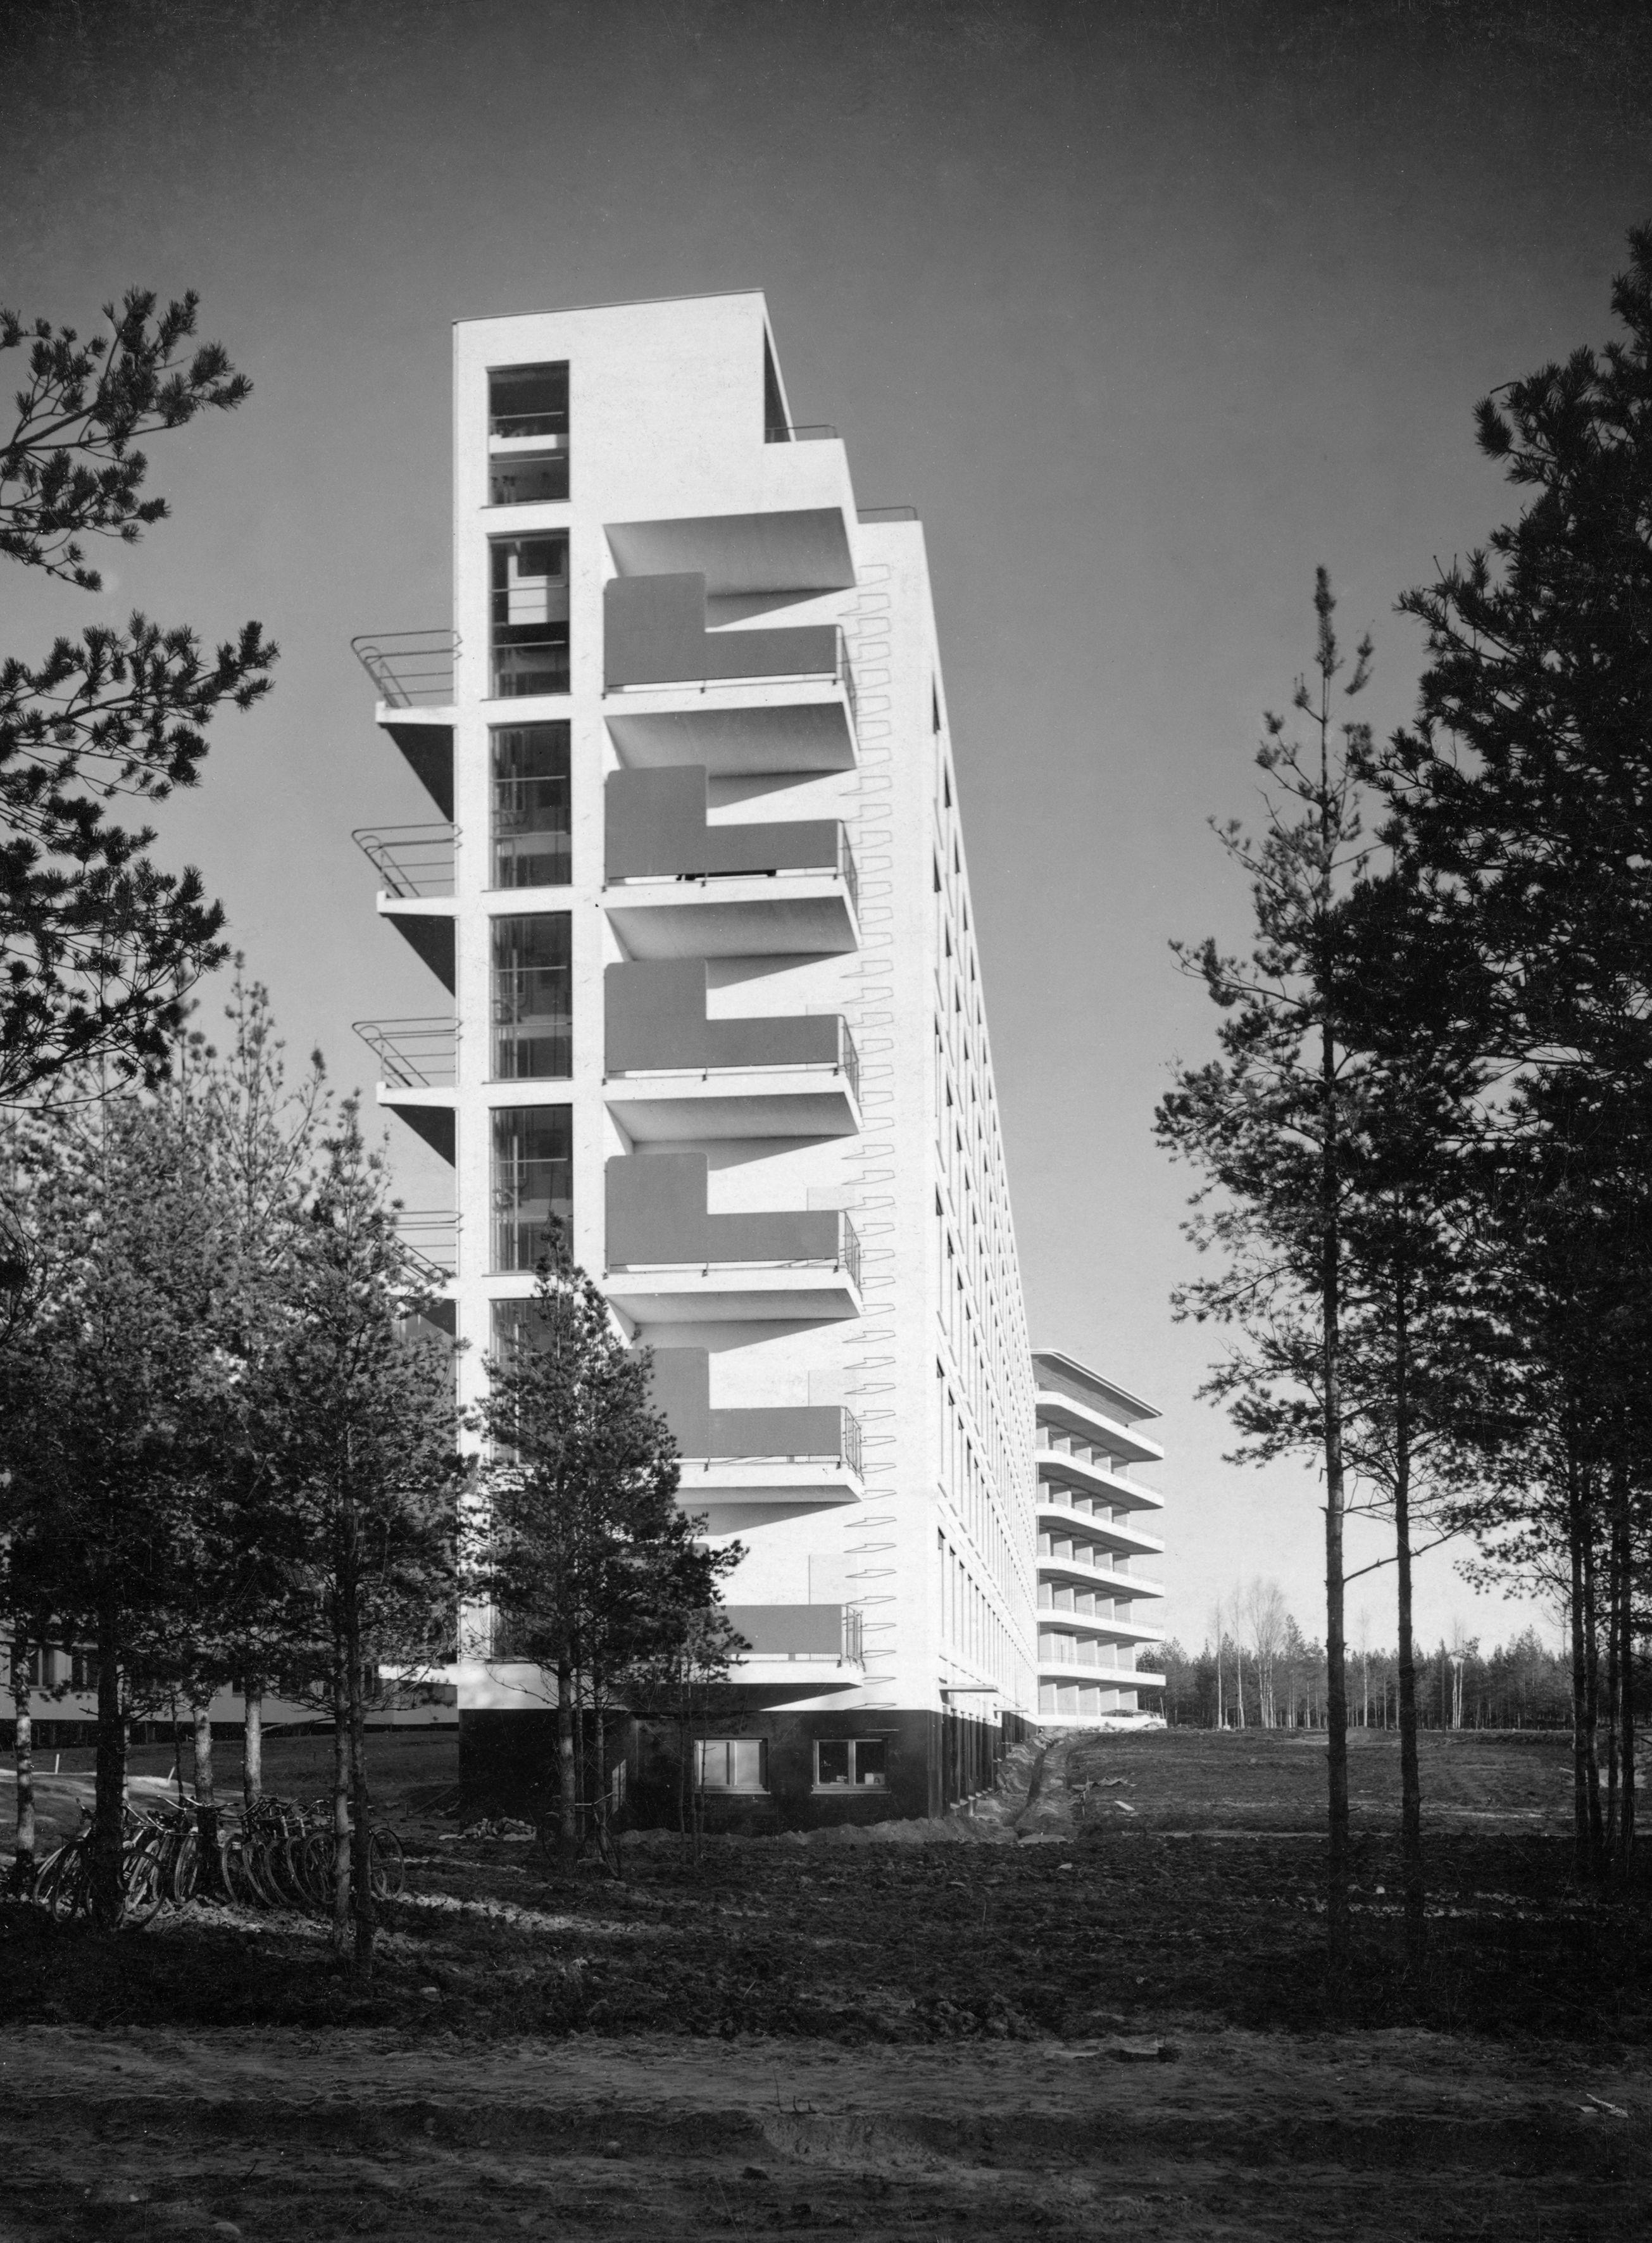 Paimio Sanatorium will open the spring season at the Alvar Aalto Museum – Exhibition takes a new ...